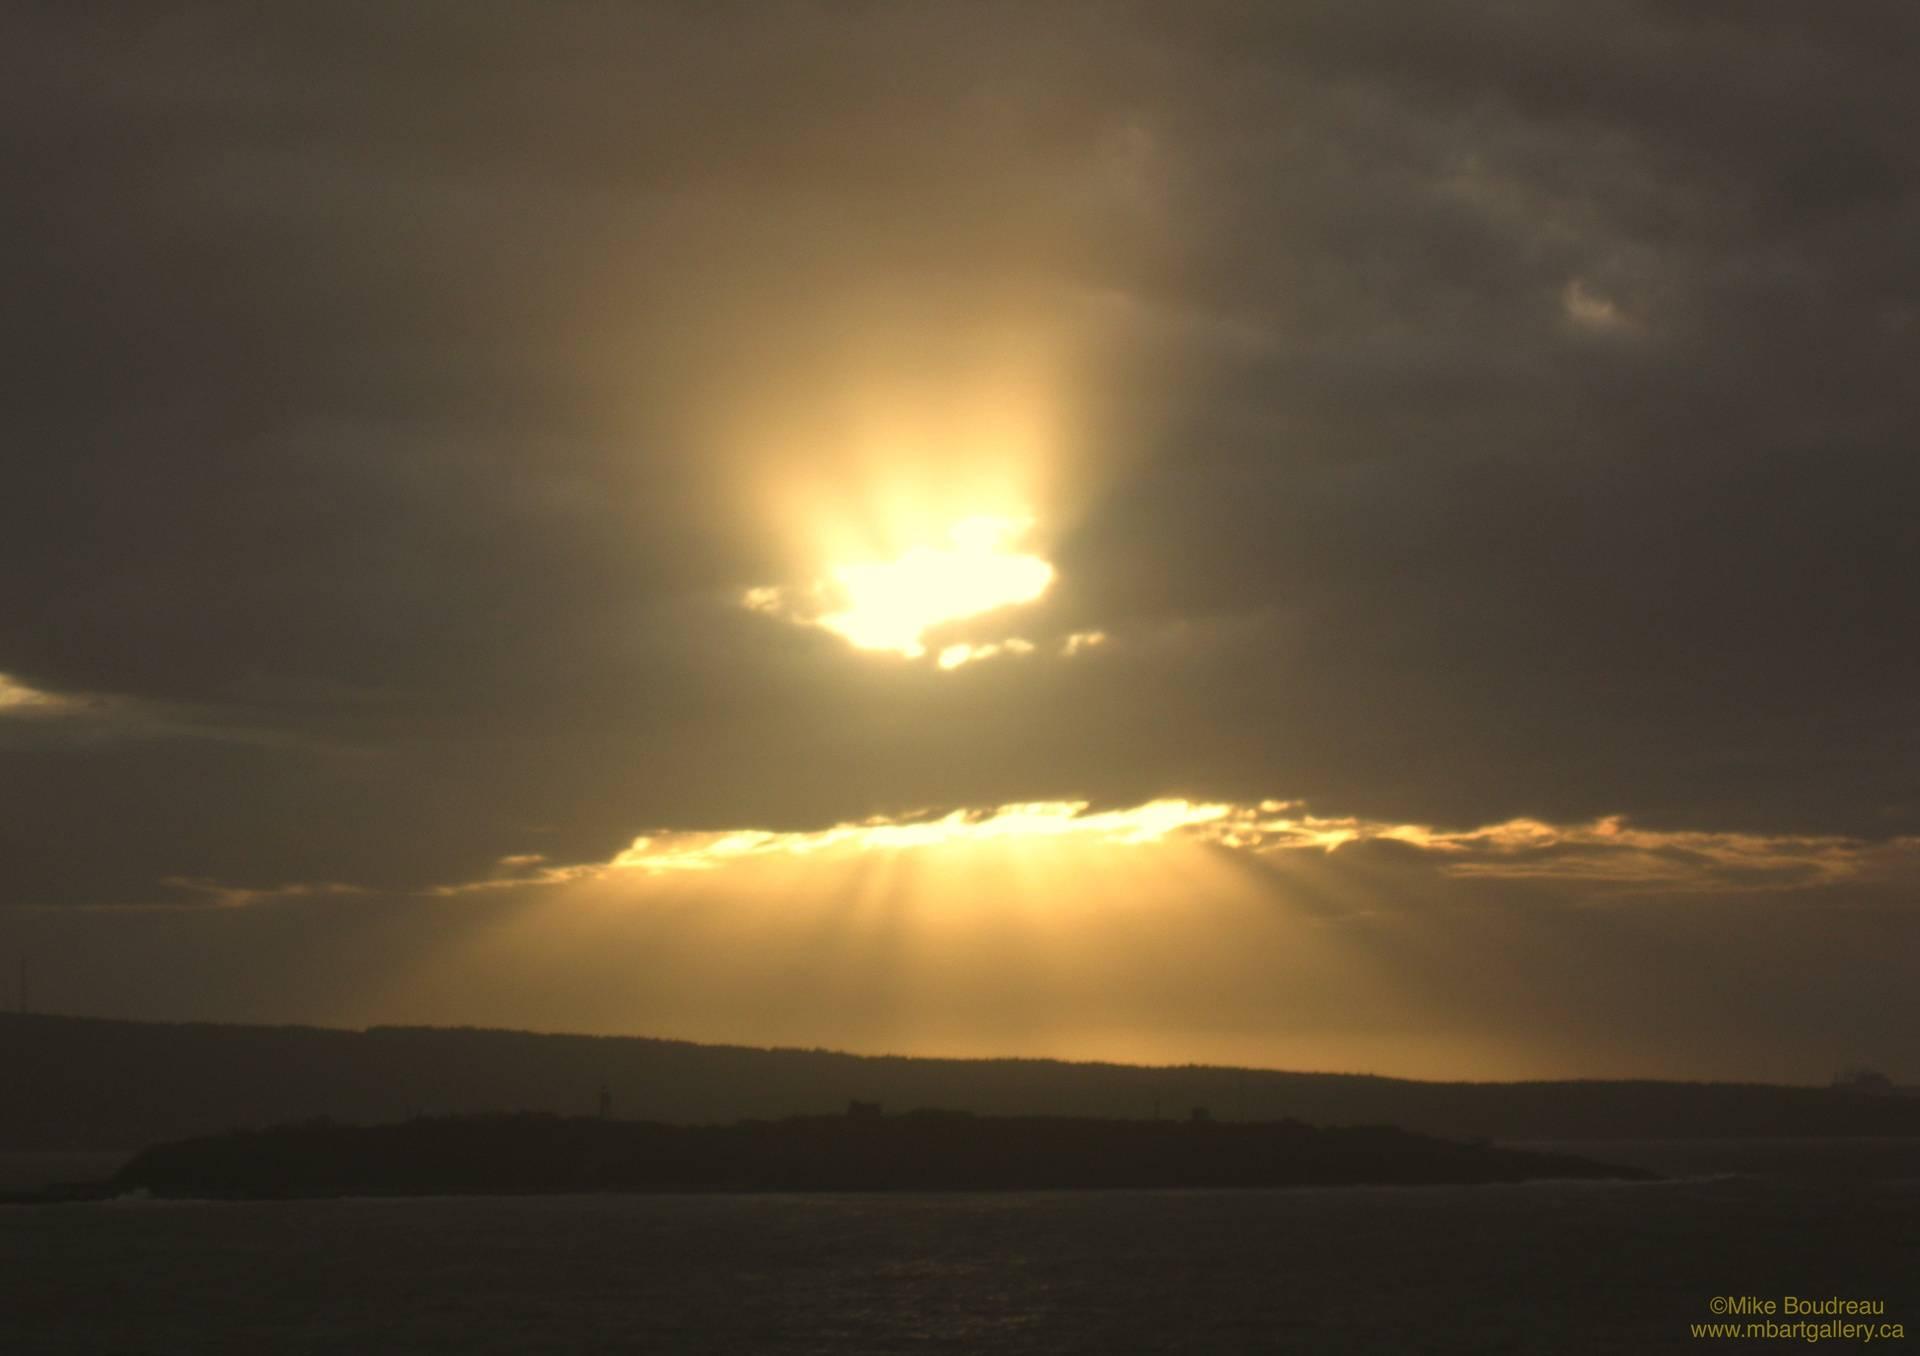 Sunrays over Partridge Island, Saint John NB